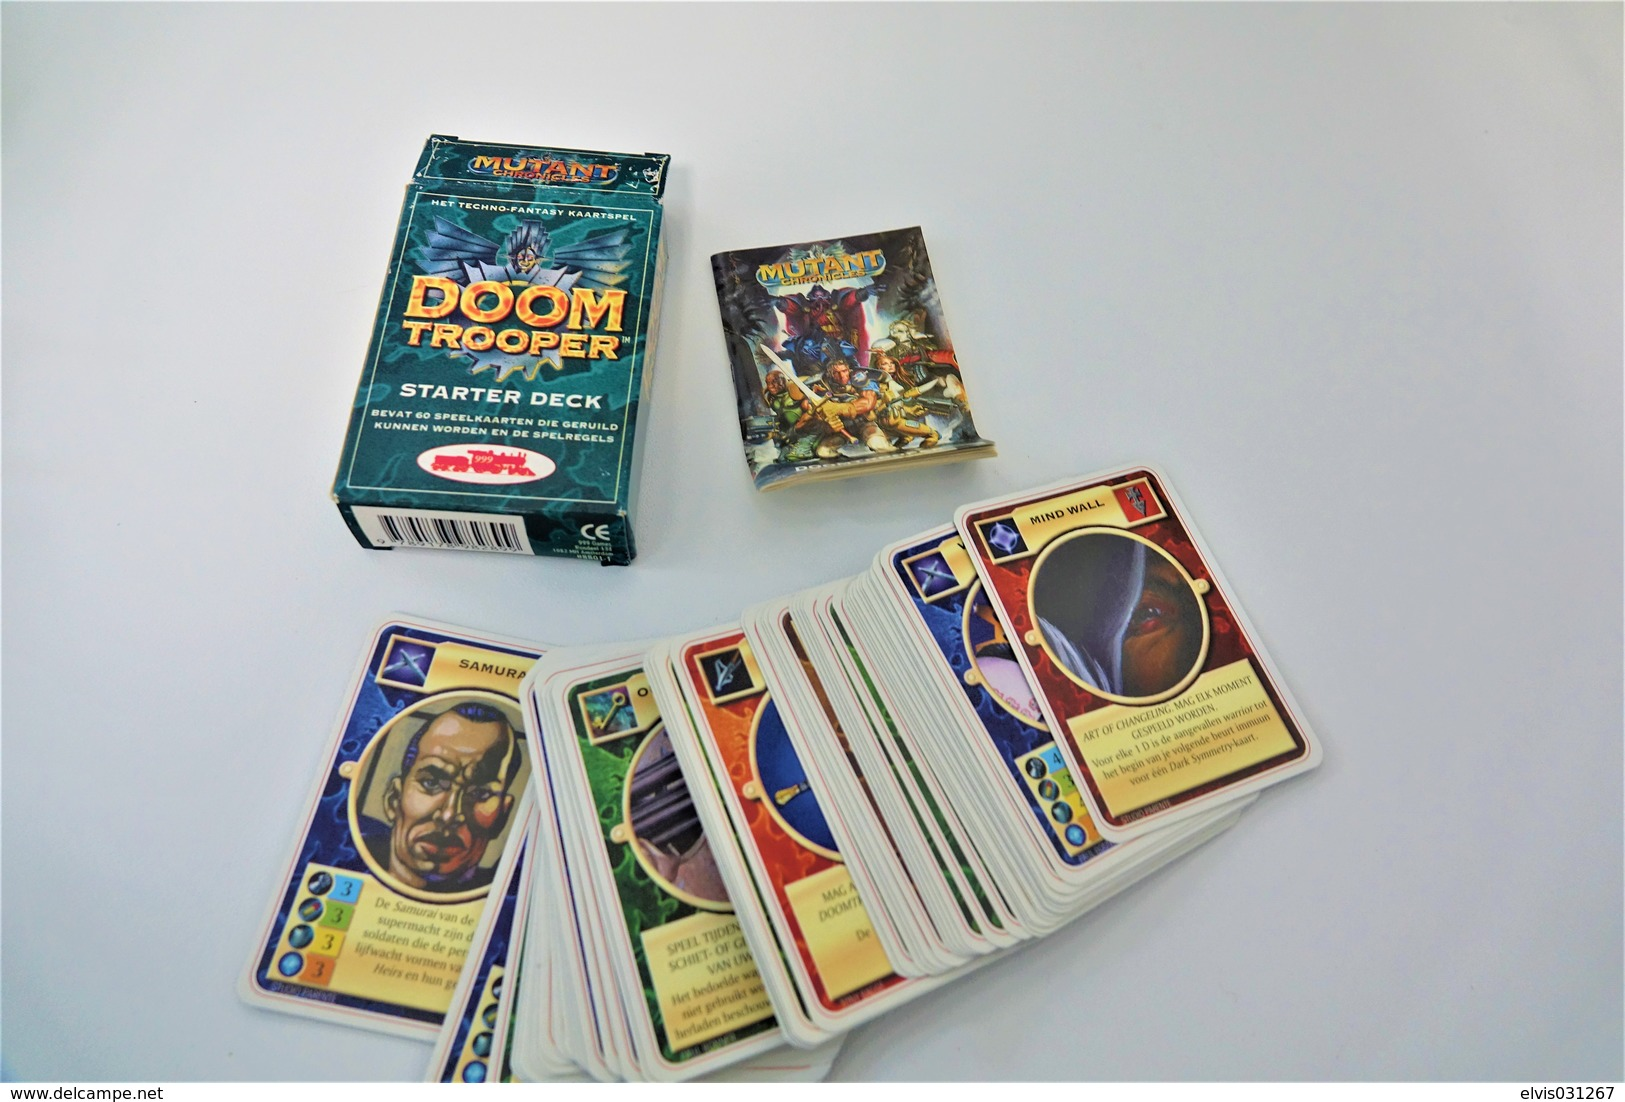 Speelkaarten - Kwartet, DOOM TROOPER - The Cardgame - Rulebook + Starter Deck  Collectable Playing Cards - 1995 - Cartes à Jouer Classiques